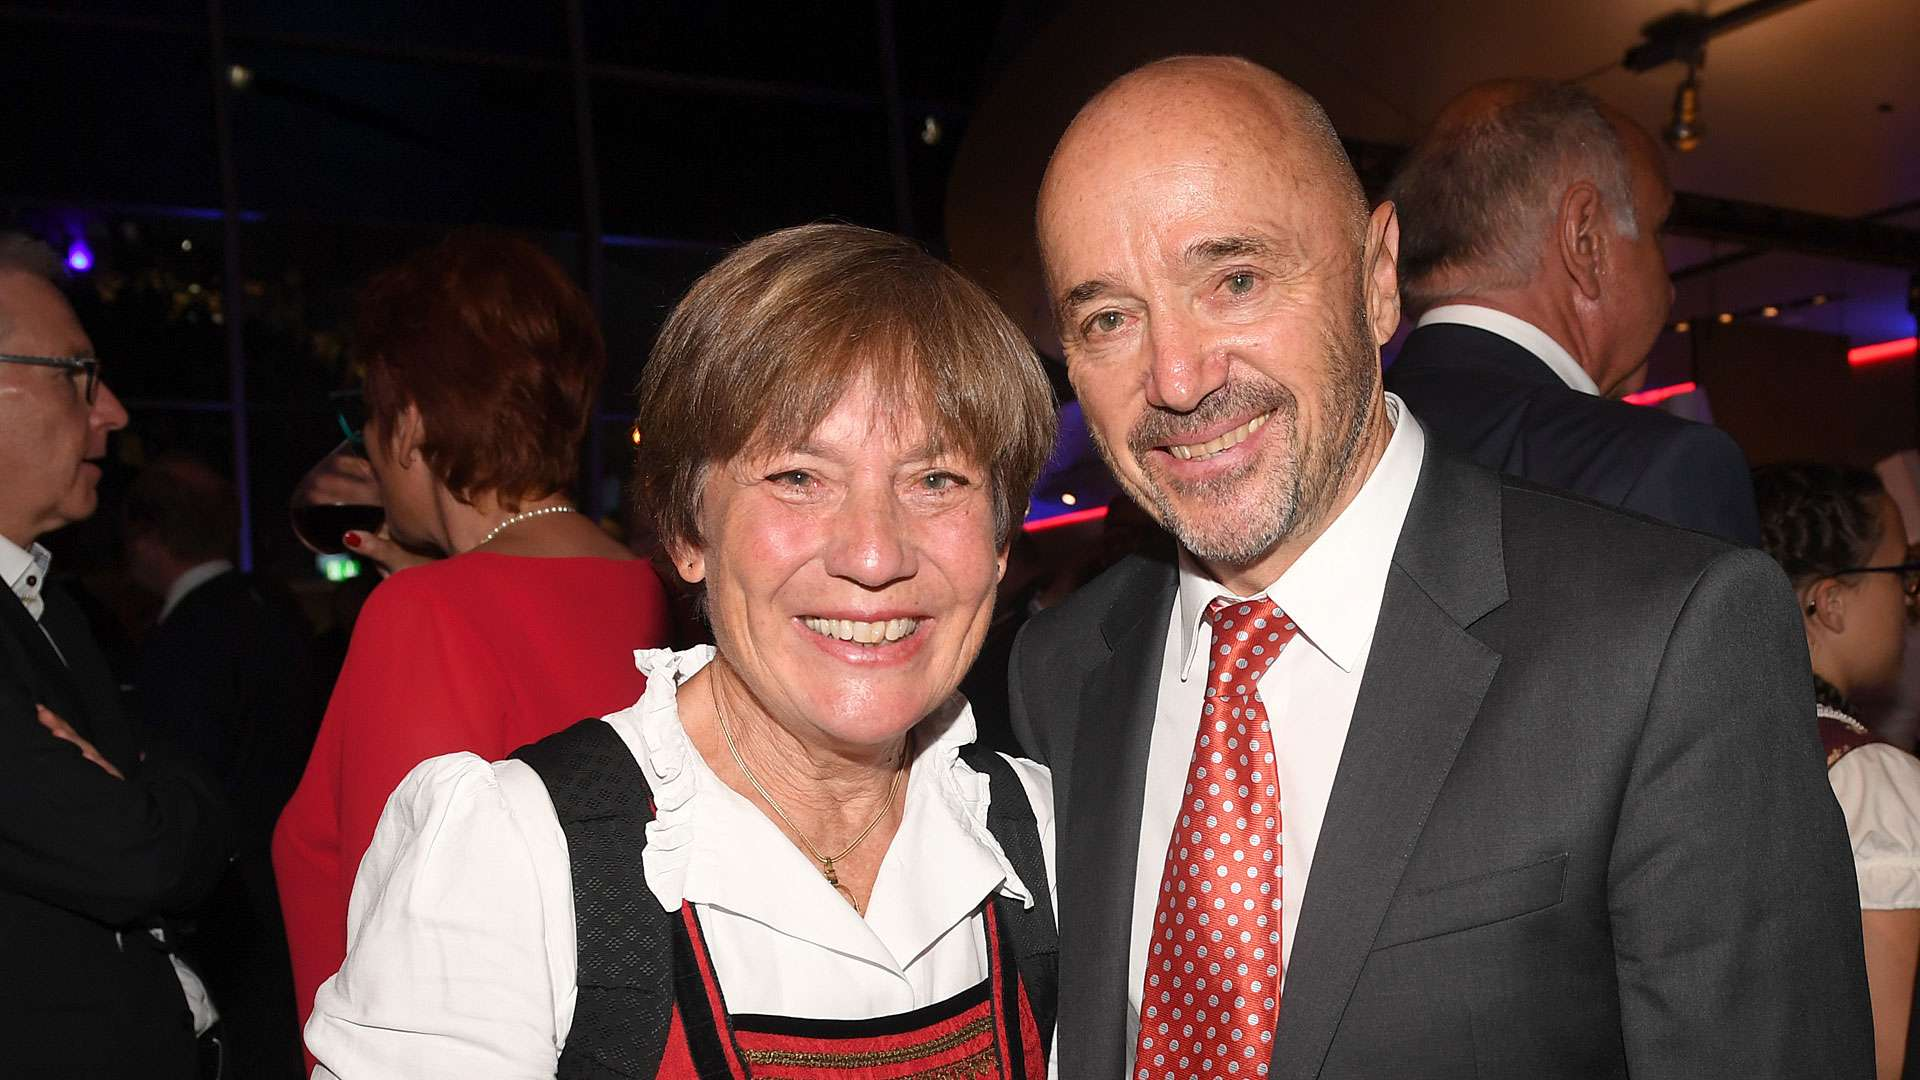 Christian Neureuther mit Ehefrau Rosi Mittemaier